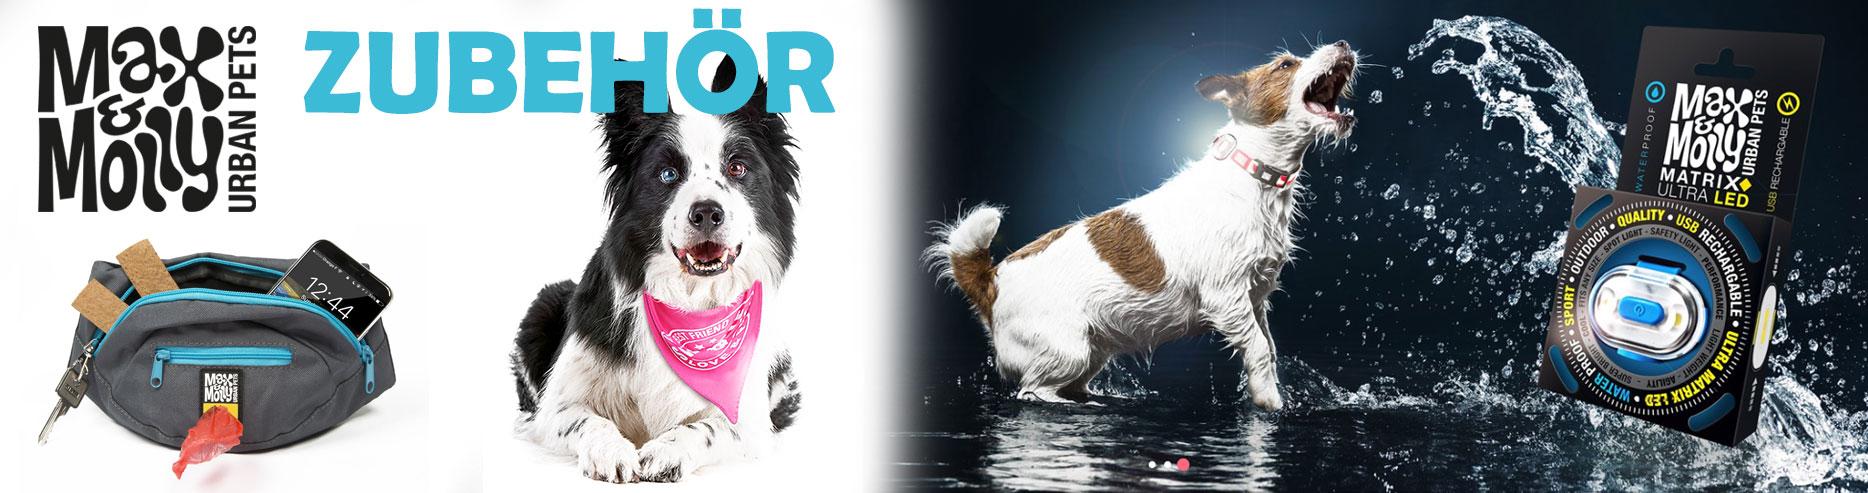 Max & Molly Zubehör für Hunde